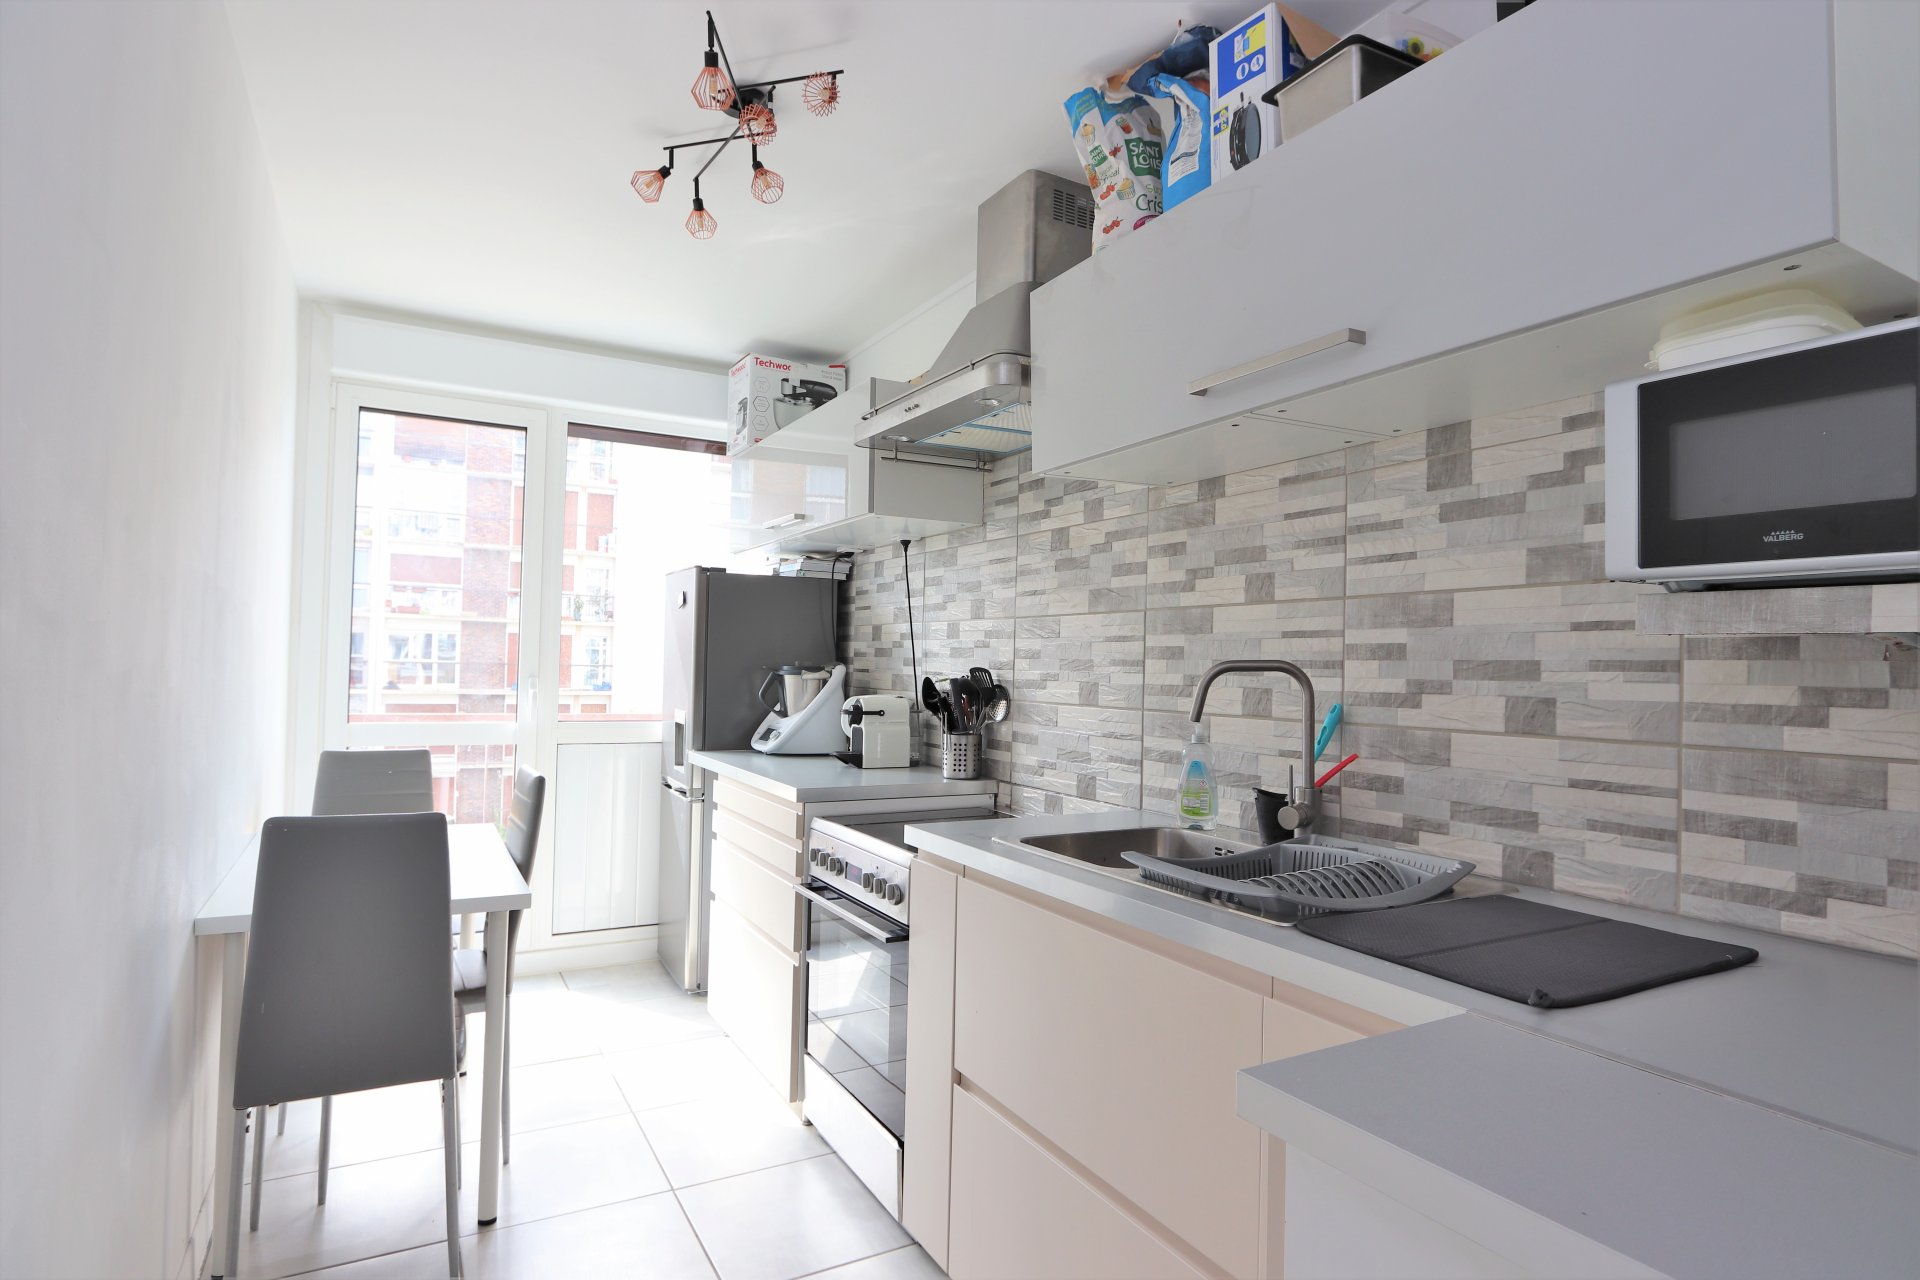 Venda Apartamento - Boussy-Saint-Antoine